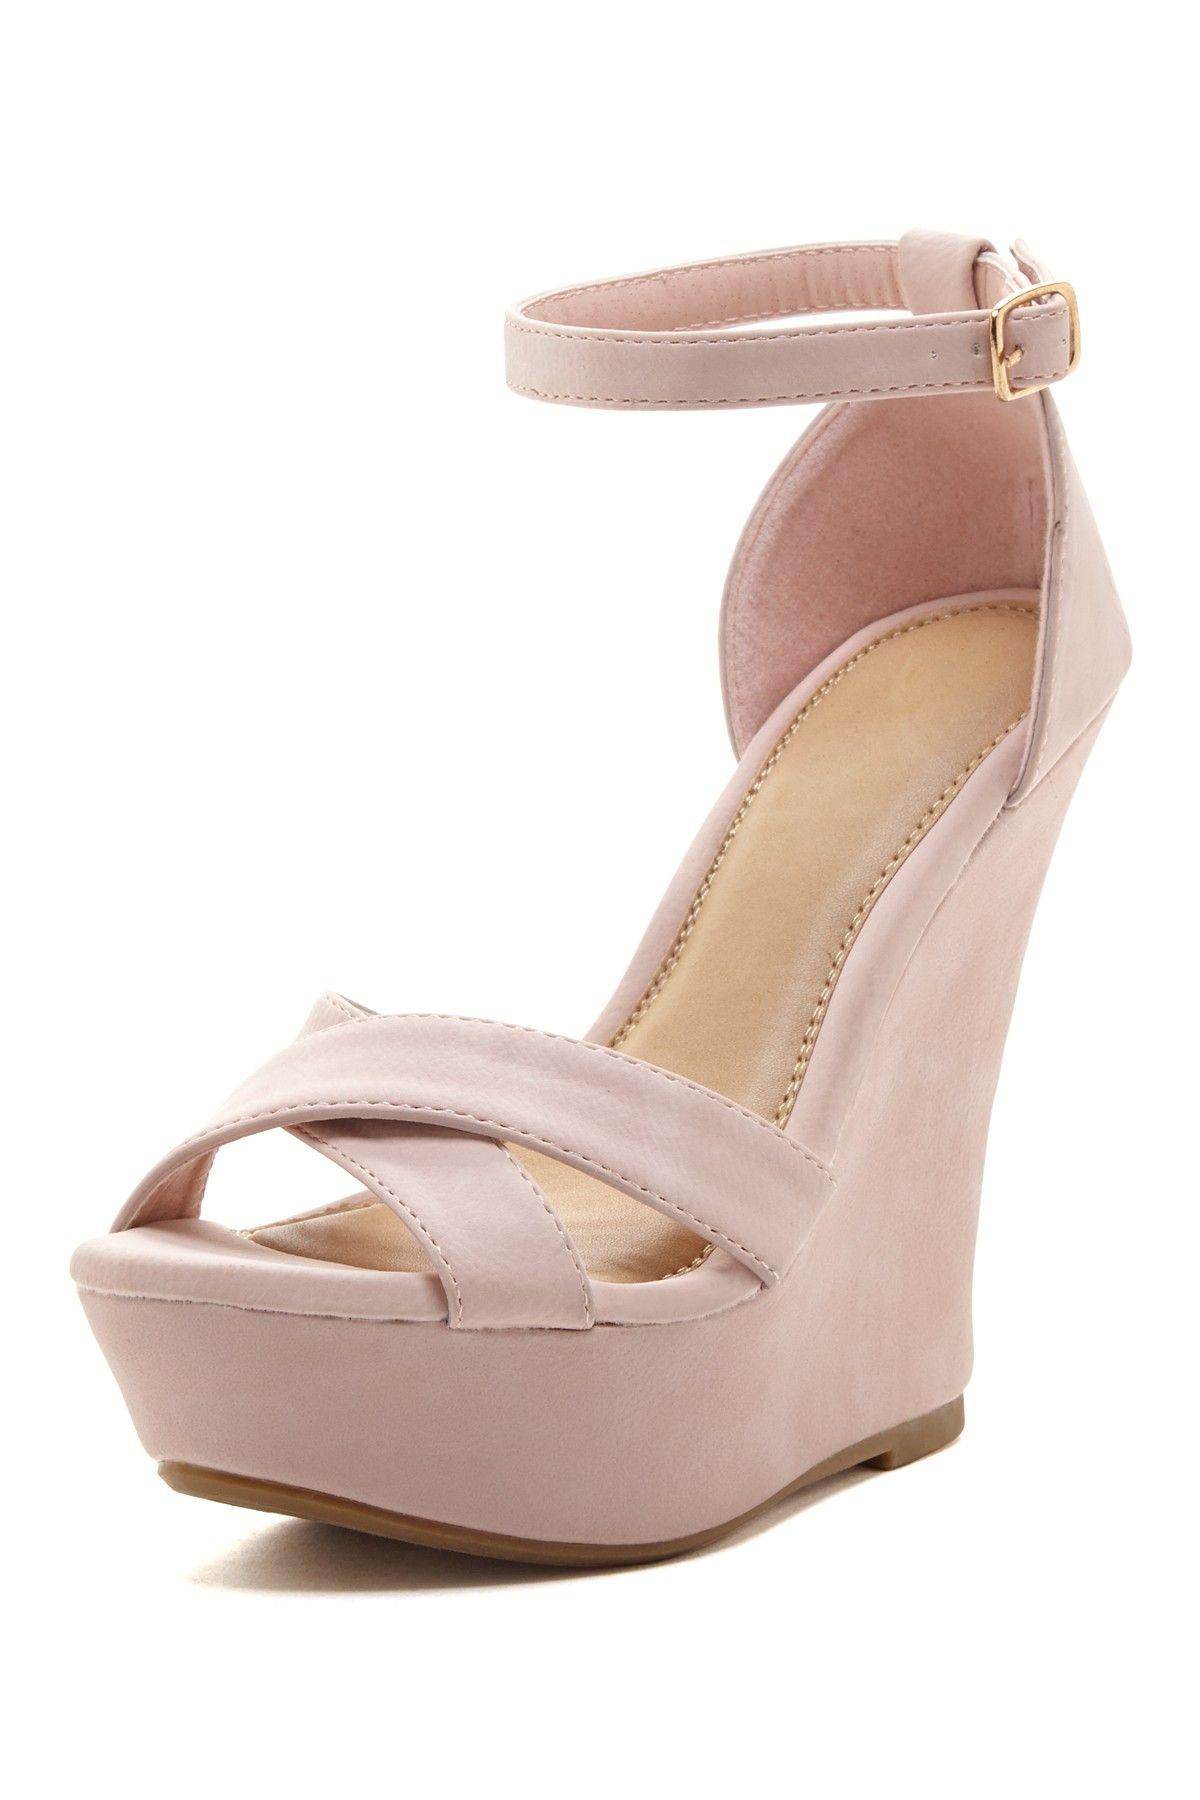 Ardo Wedge Ankle Strap Sandal// | Wedge